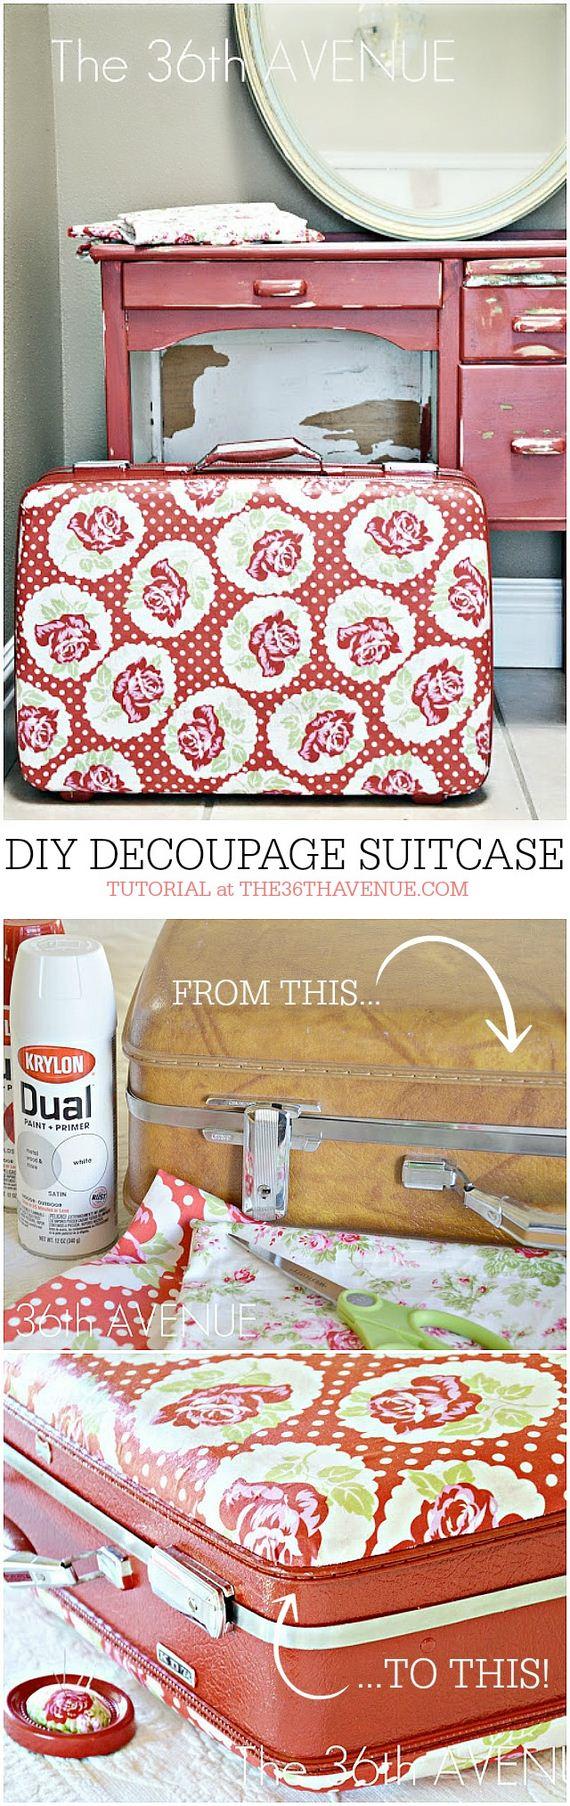 01-Decoupage-Suitcase-Tutorial